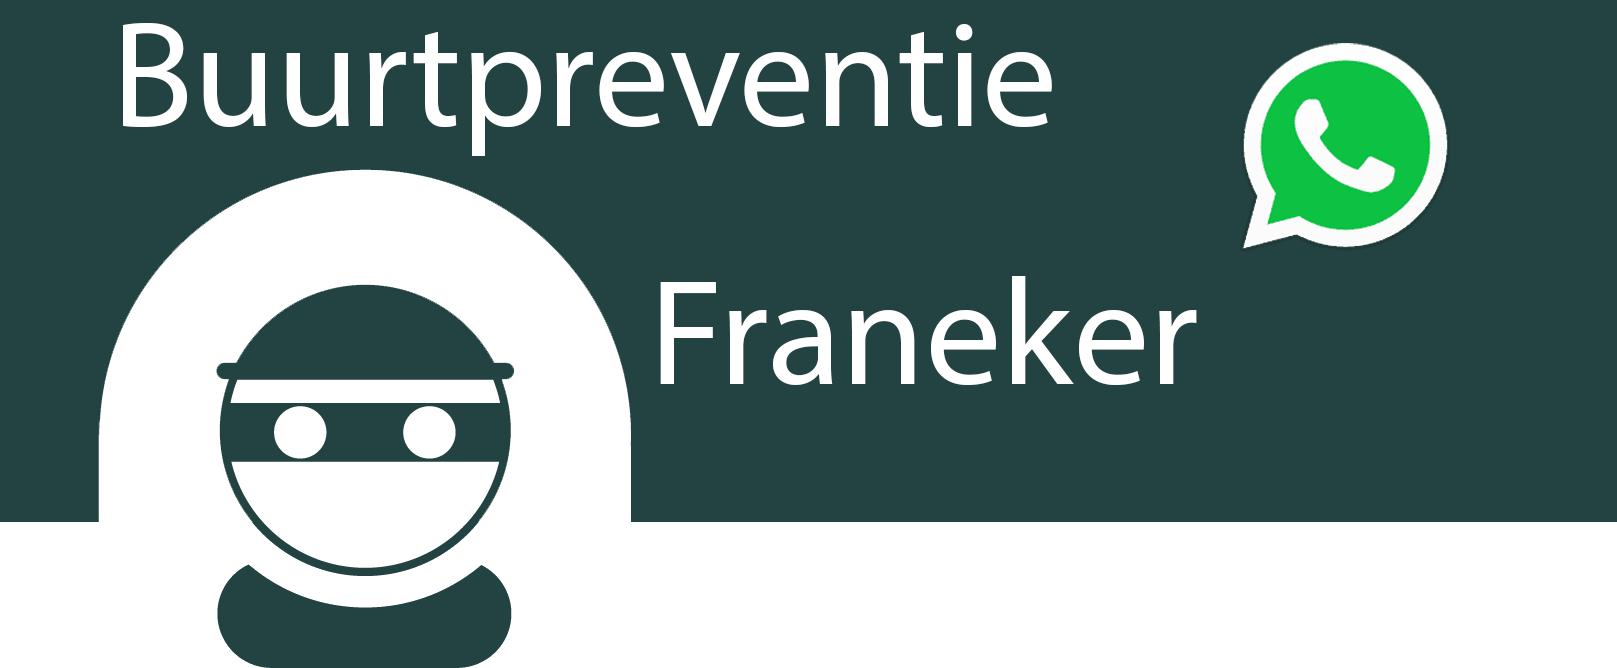 buurtpreventie franeker